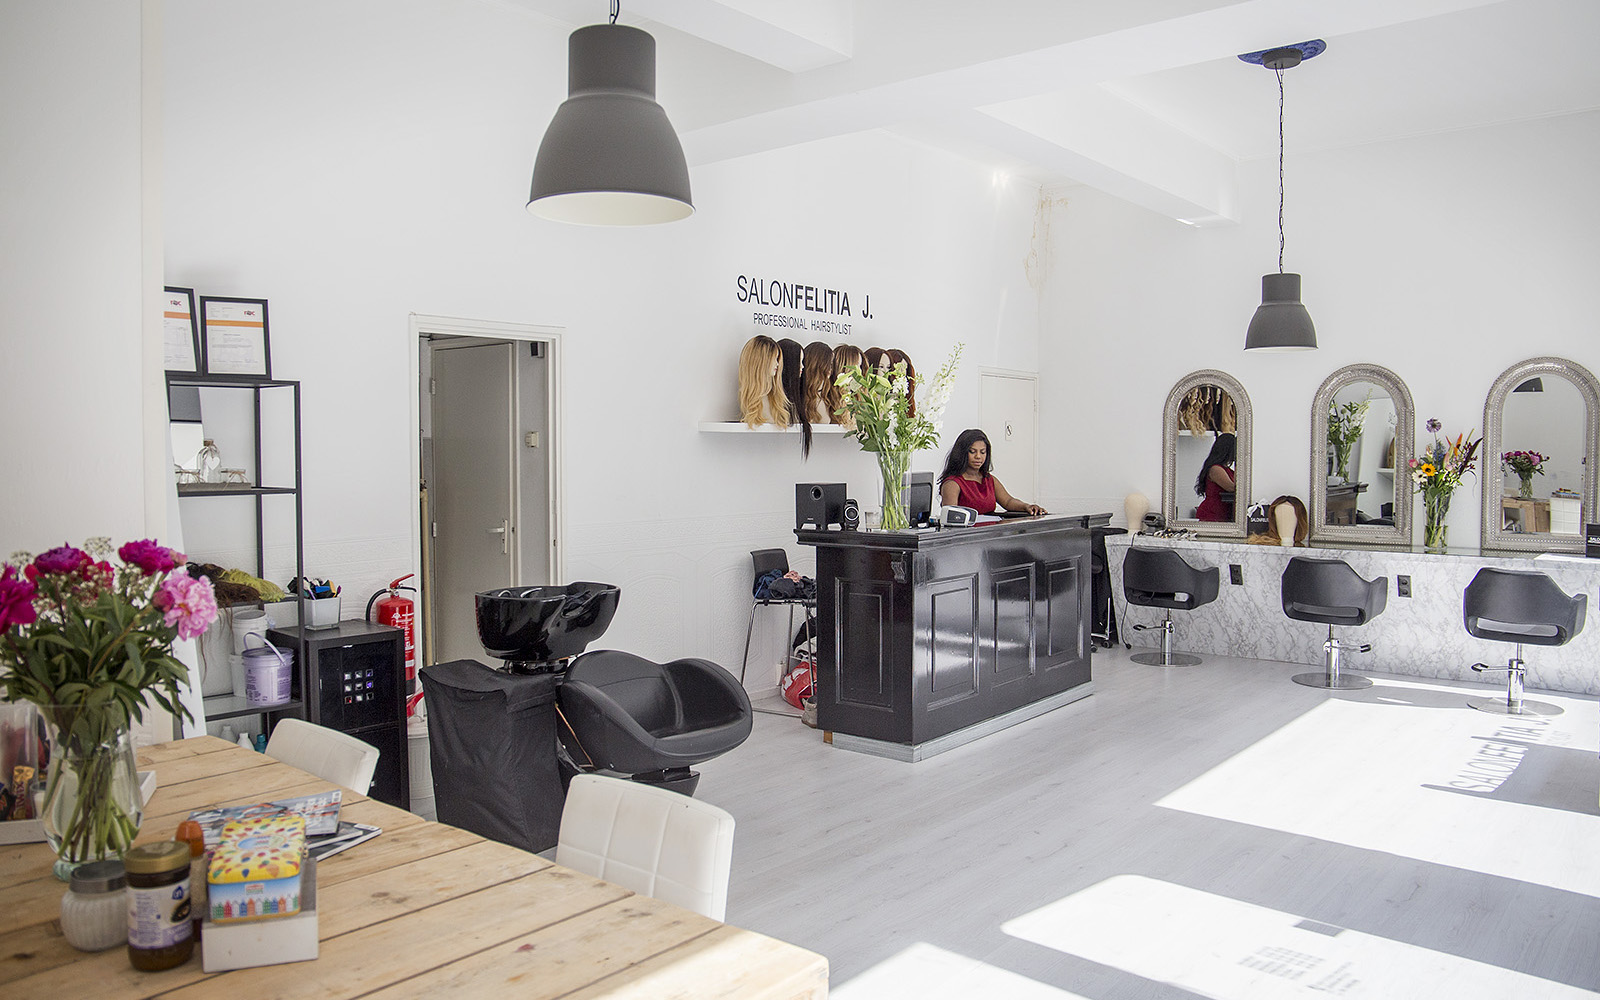 Salon Felitia in het Hoogkwartier in Rotterdam